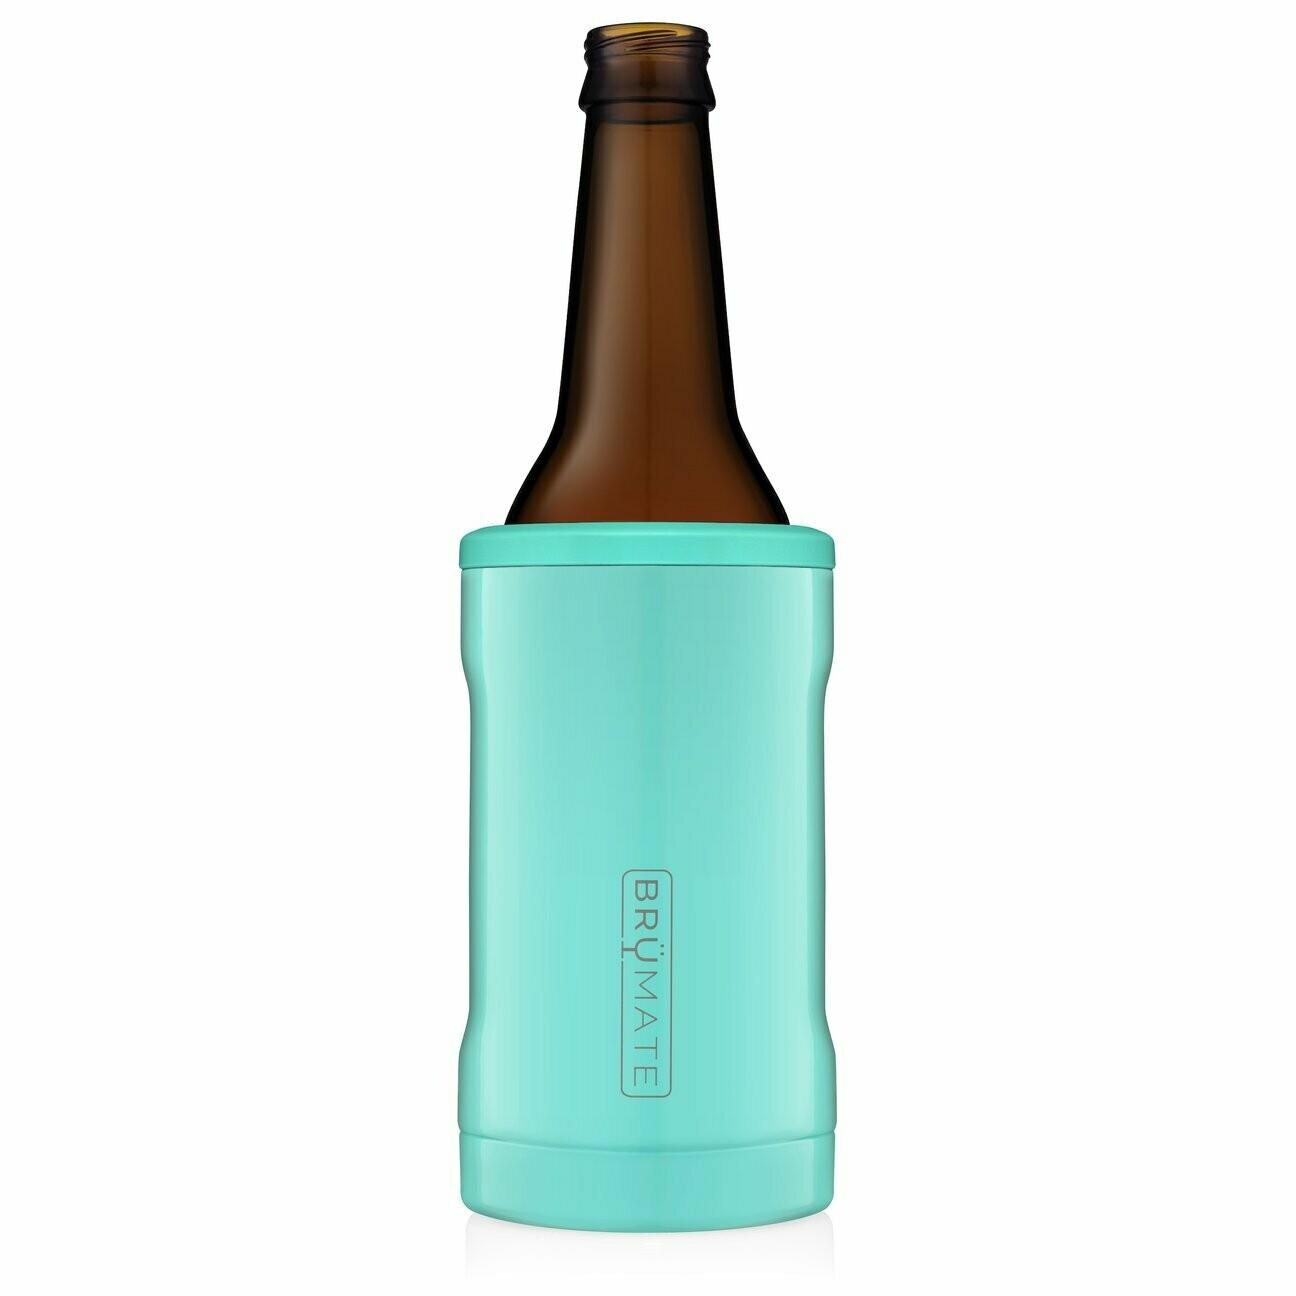 BruMate Hopsulator Insulated Bottle AQUA